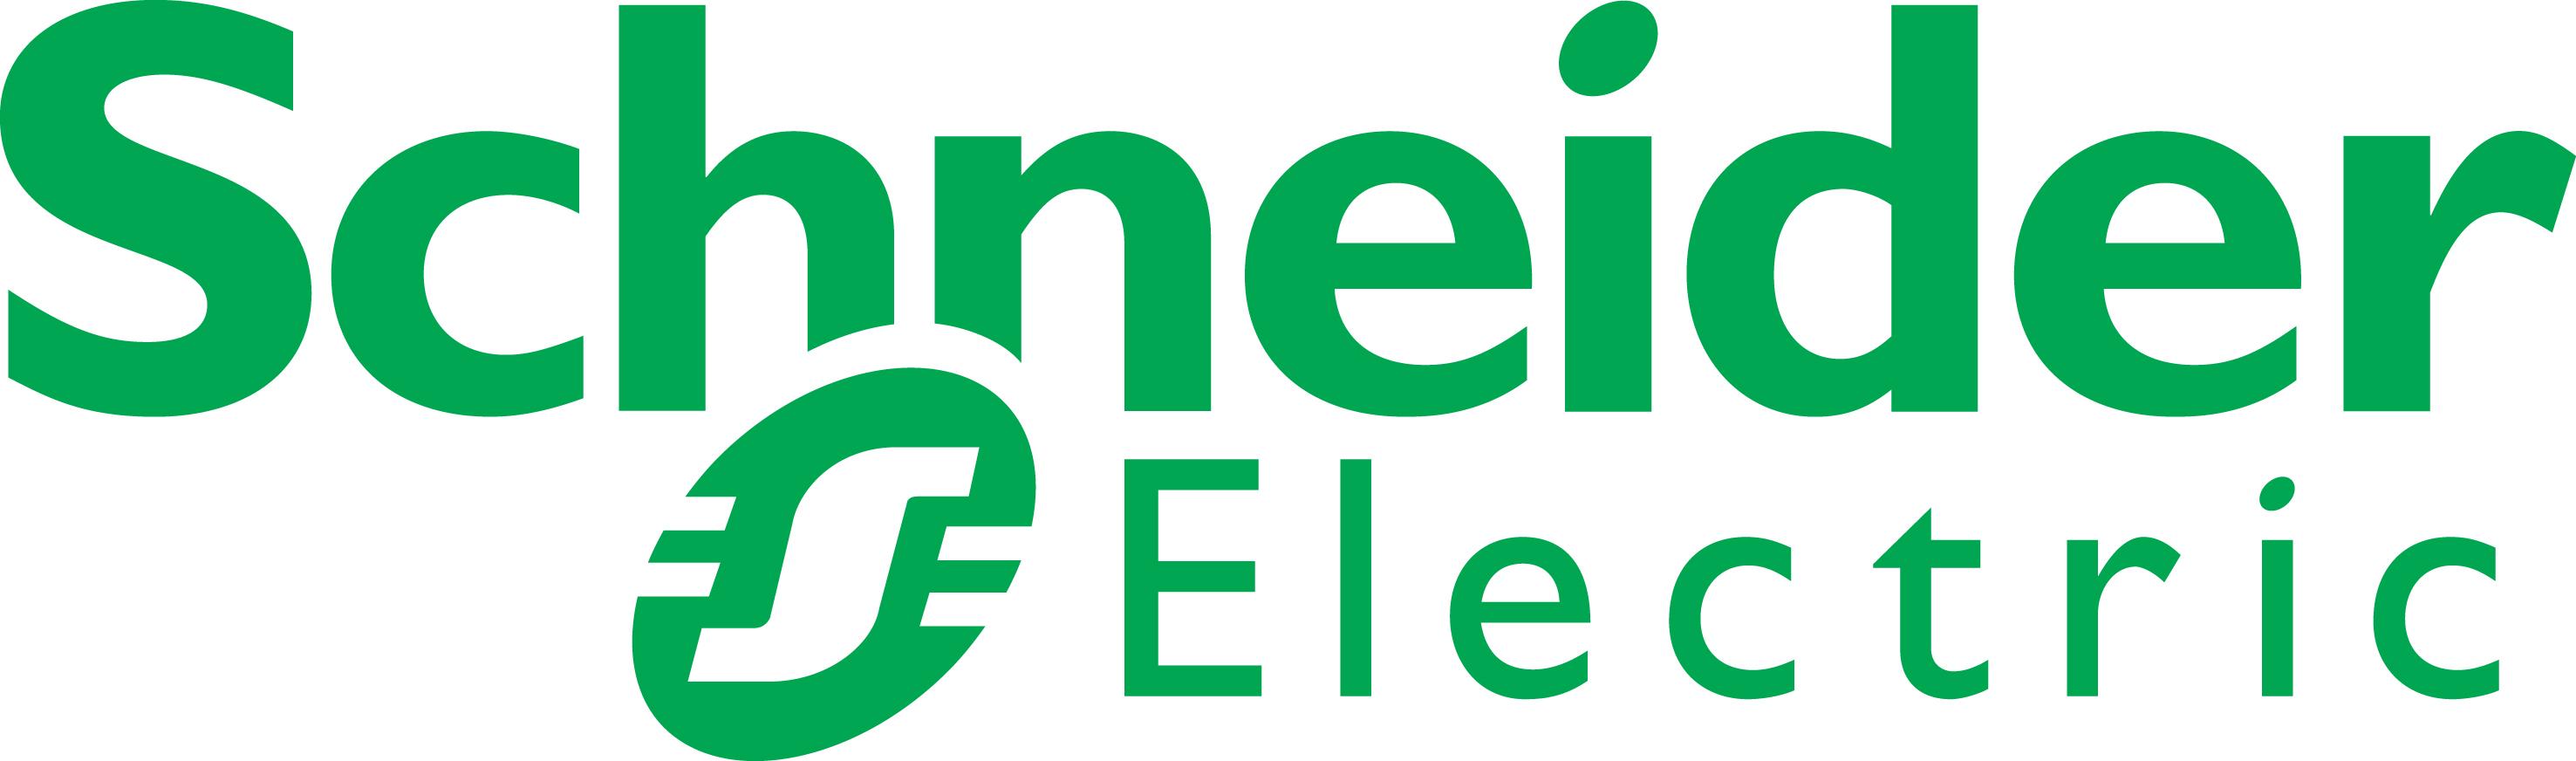 Logo thương hiệu Schneider